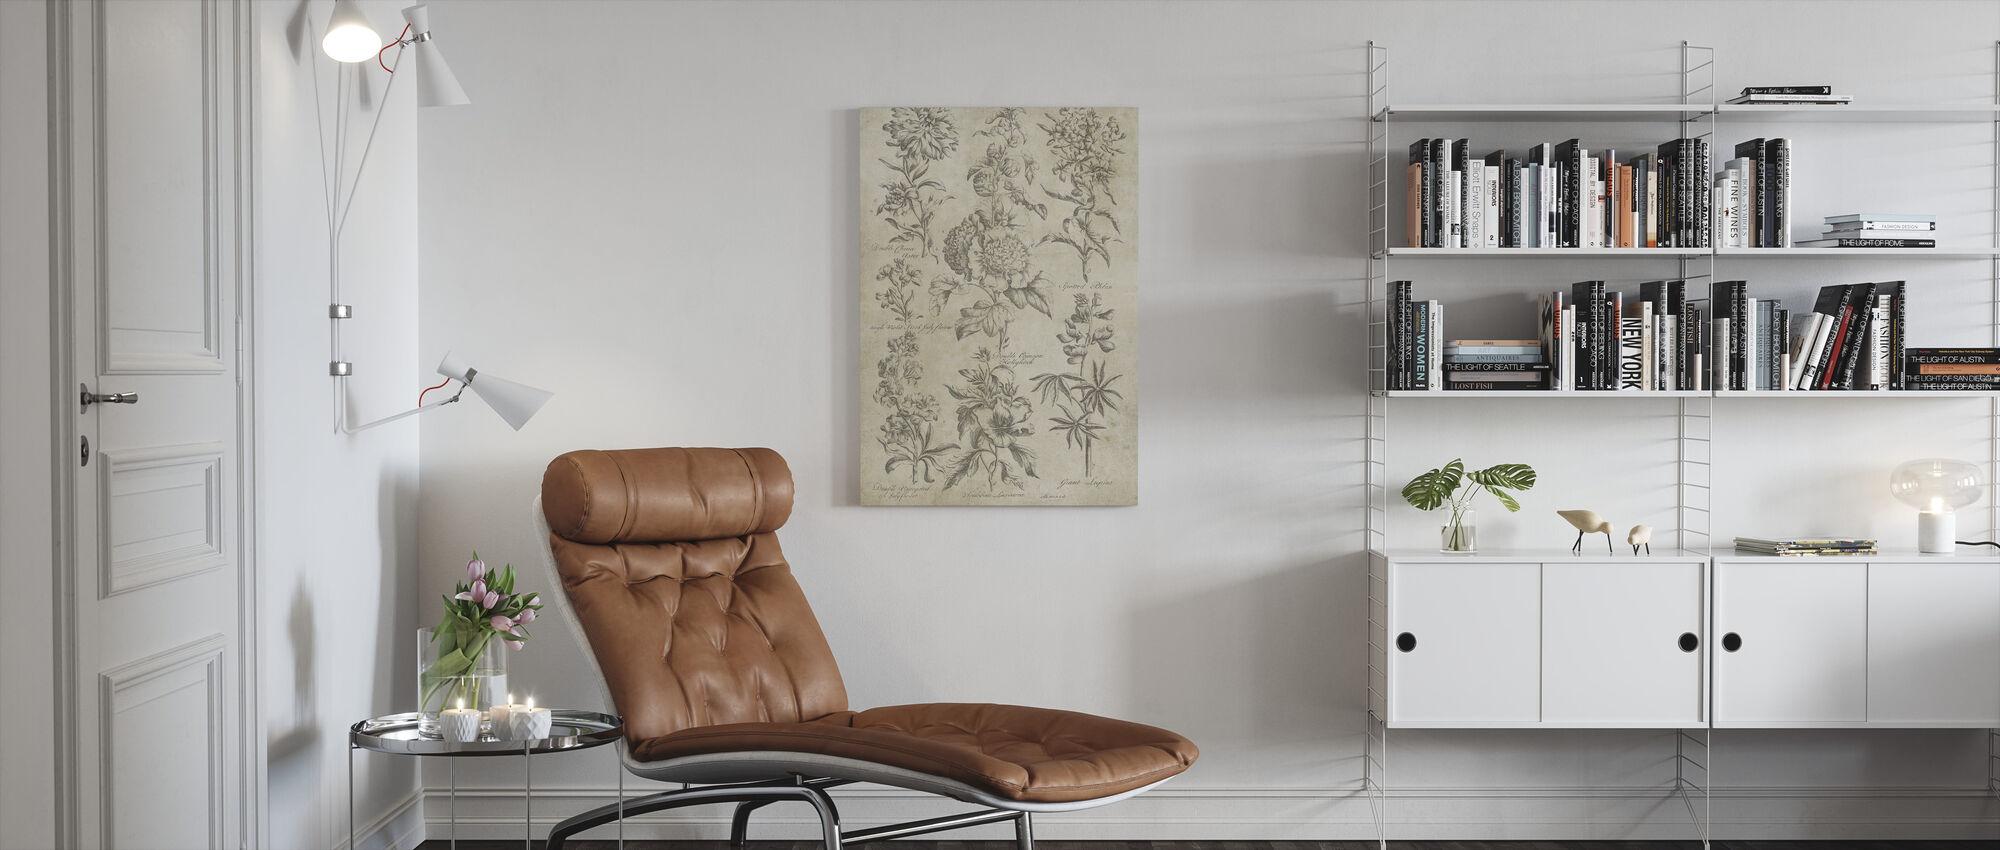 Eden Antique Bookplate - Canvas print - Living Room